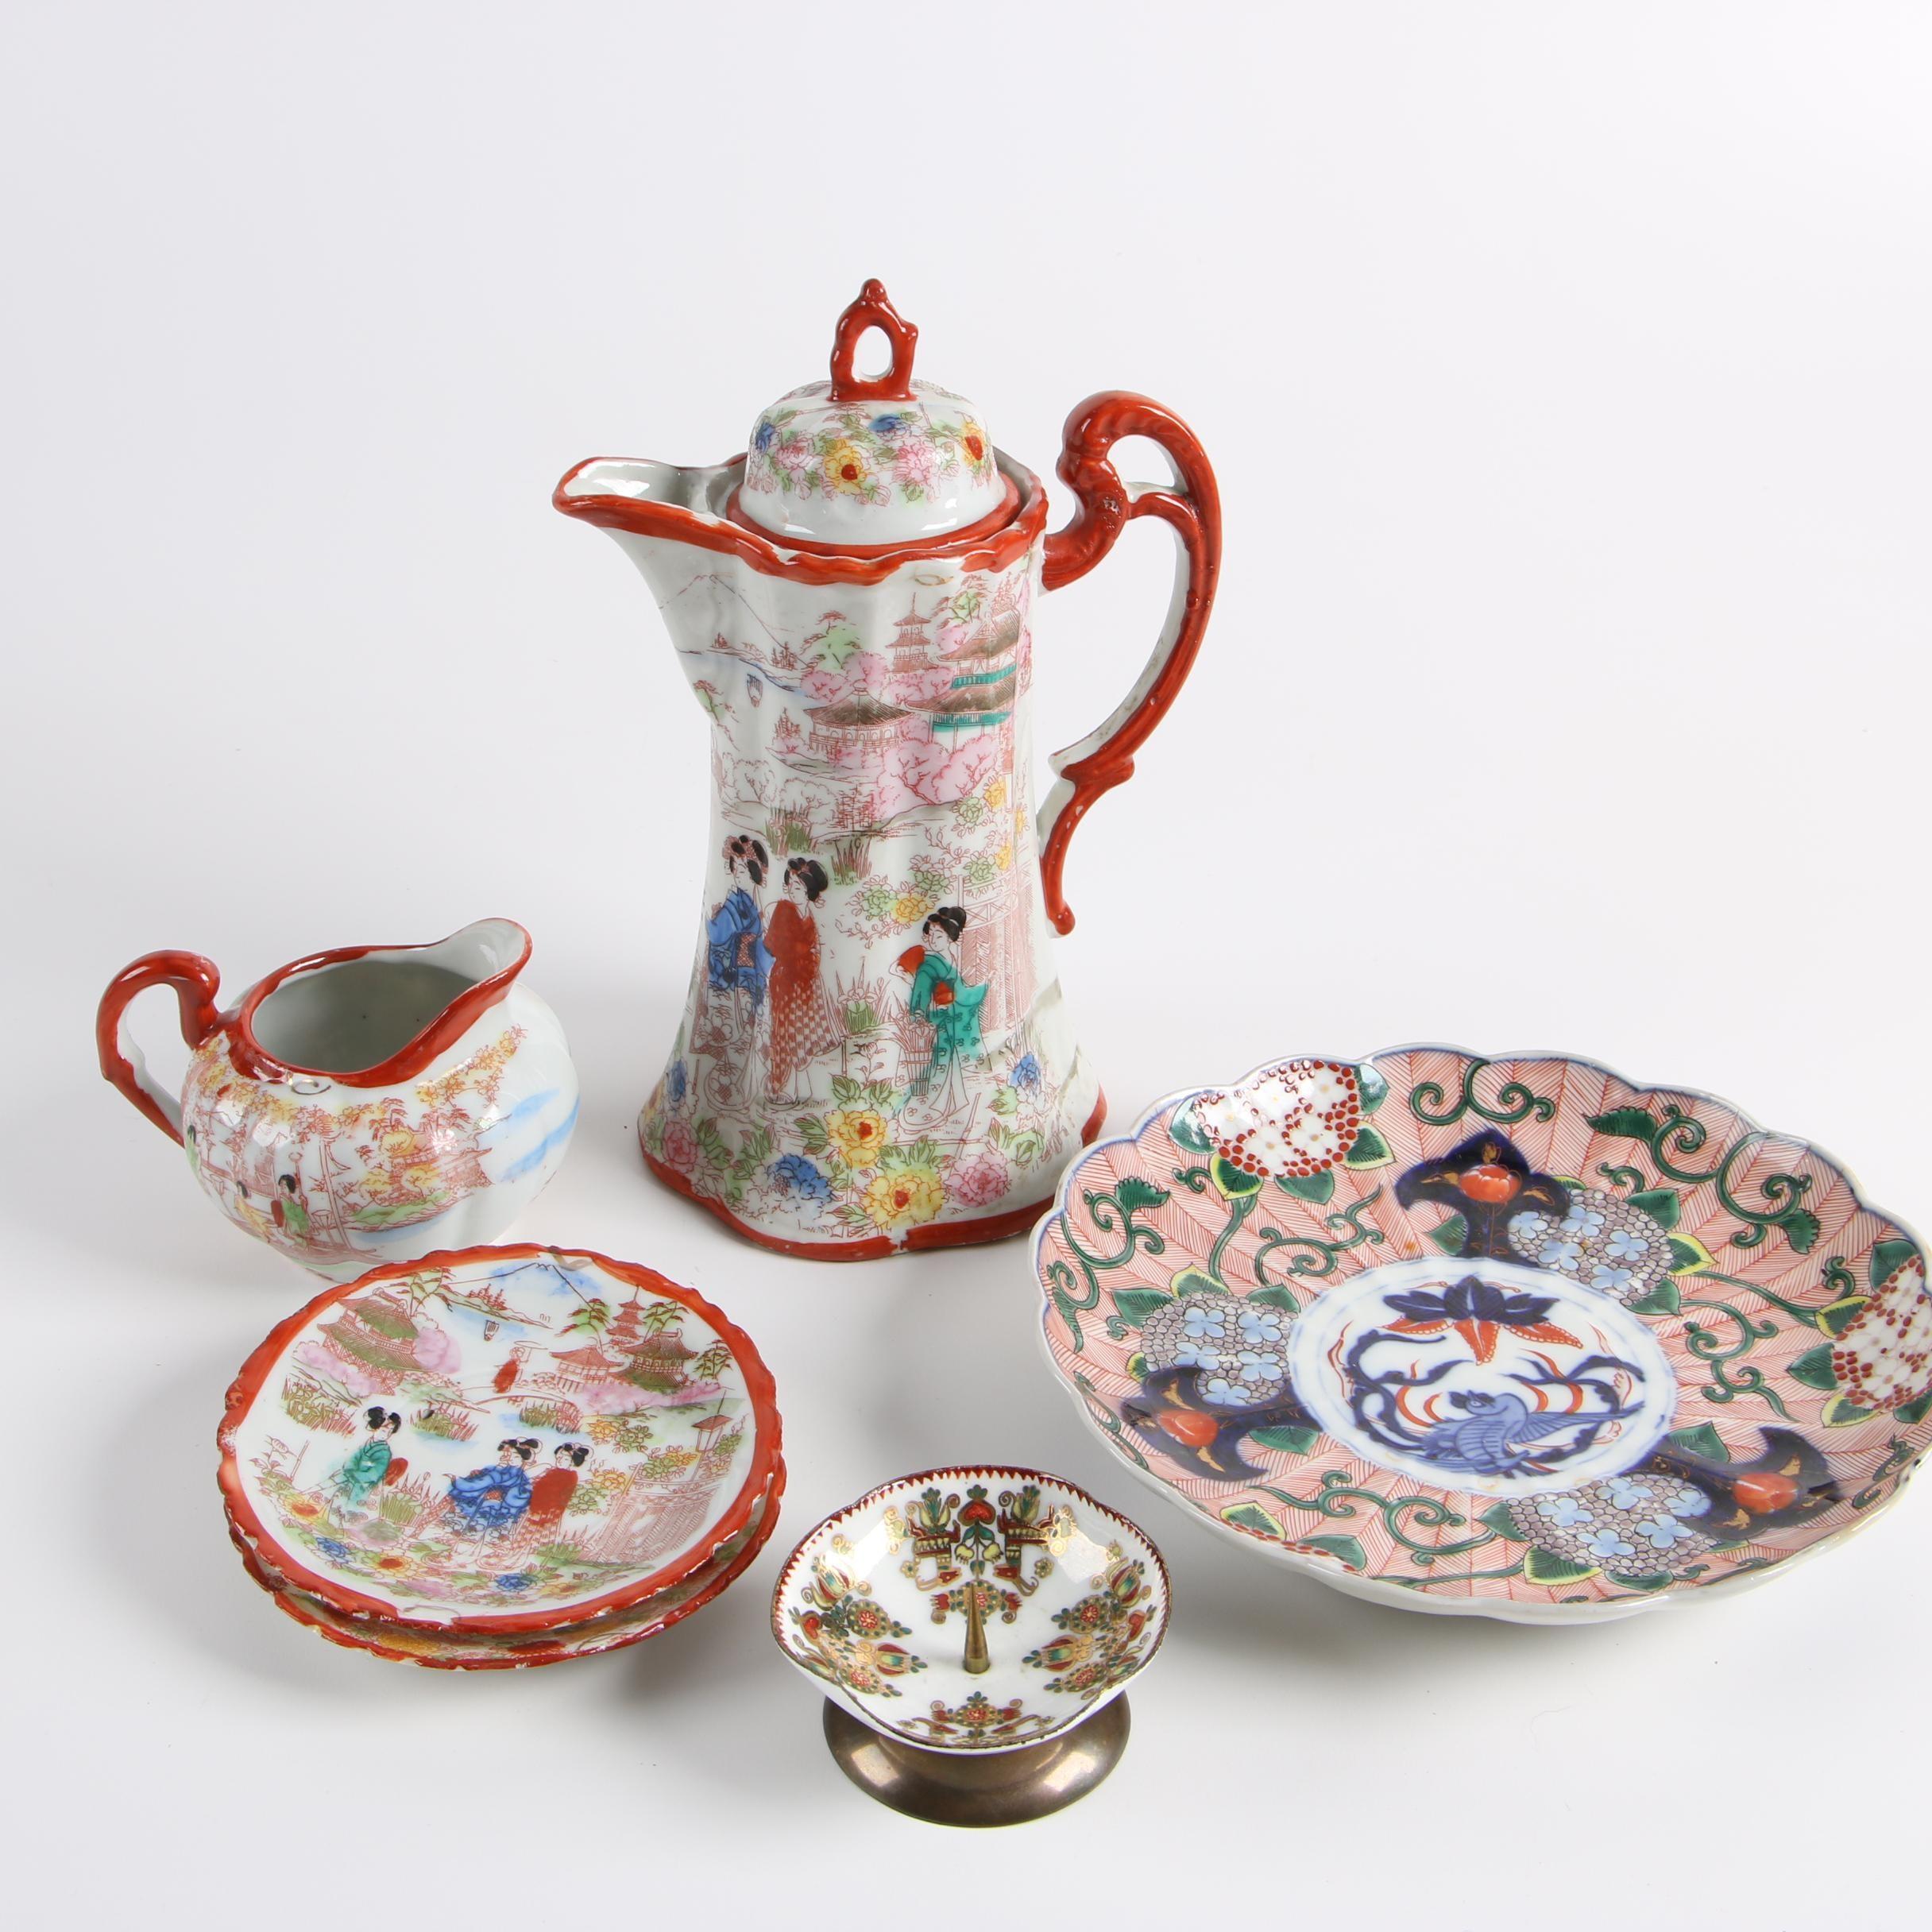 Vintage Japanese Porcelain Tableware with Austrian Enameled Candle Holder